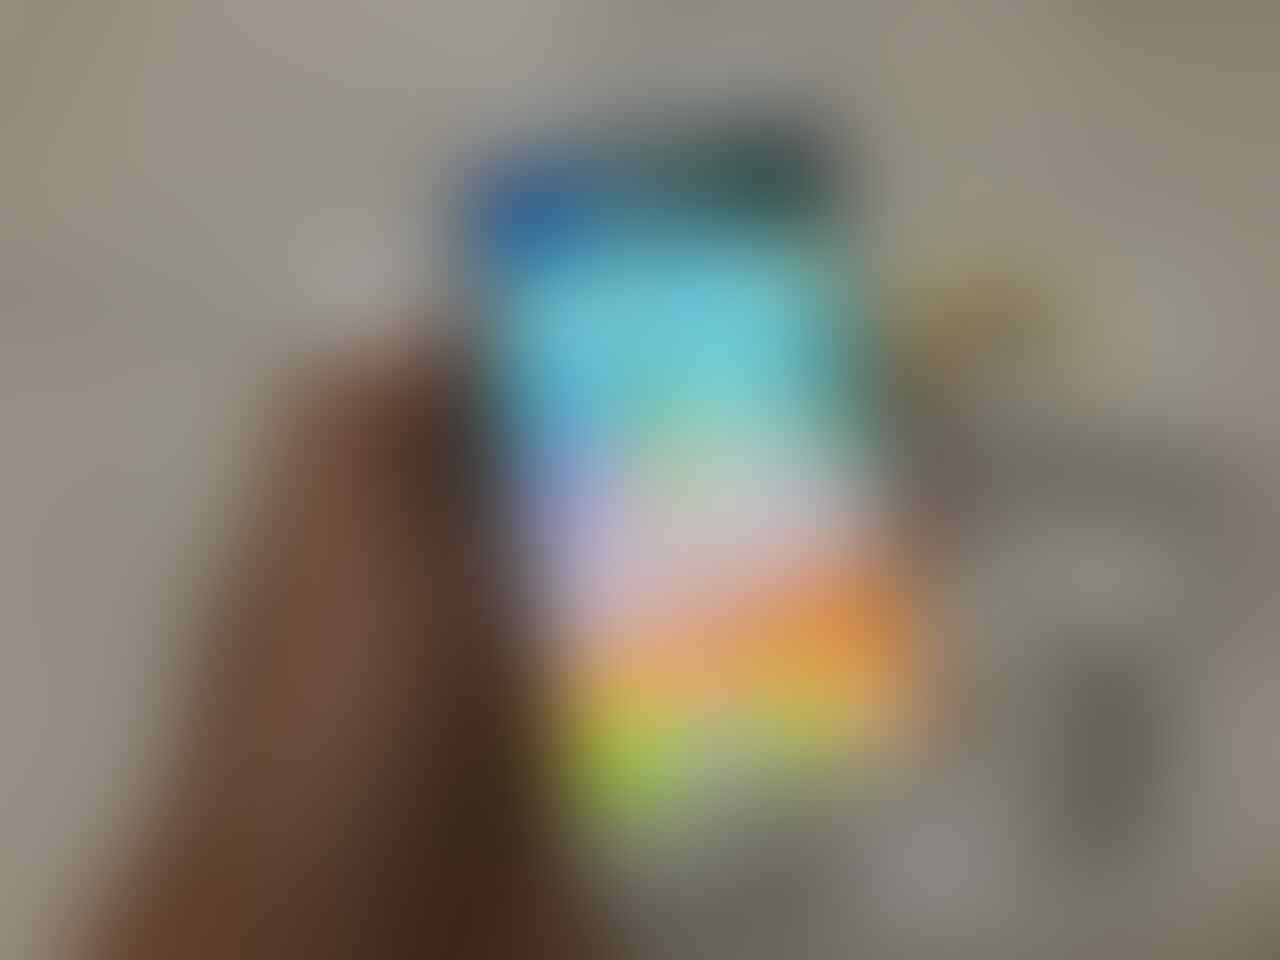 IPHONE 6S GOLD 16GB FULLSET MULUSS NORMAL MURAAAH 3150 SAJA [MALANG]